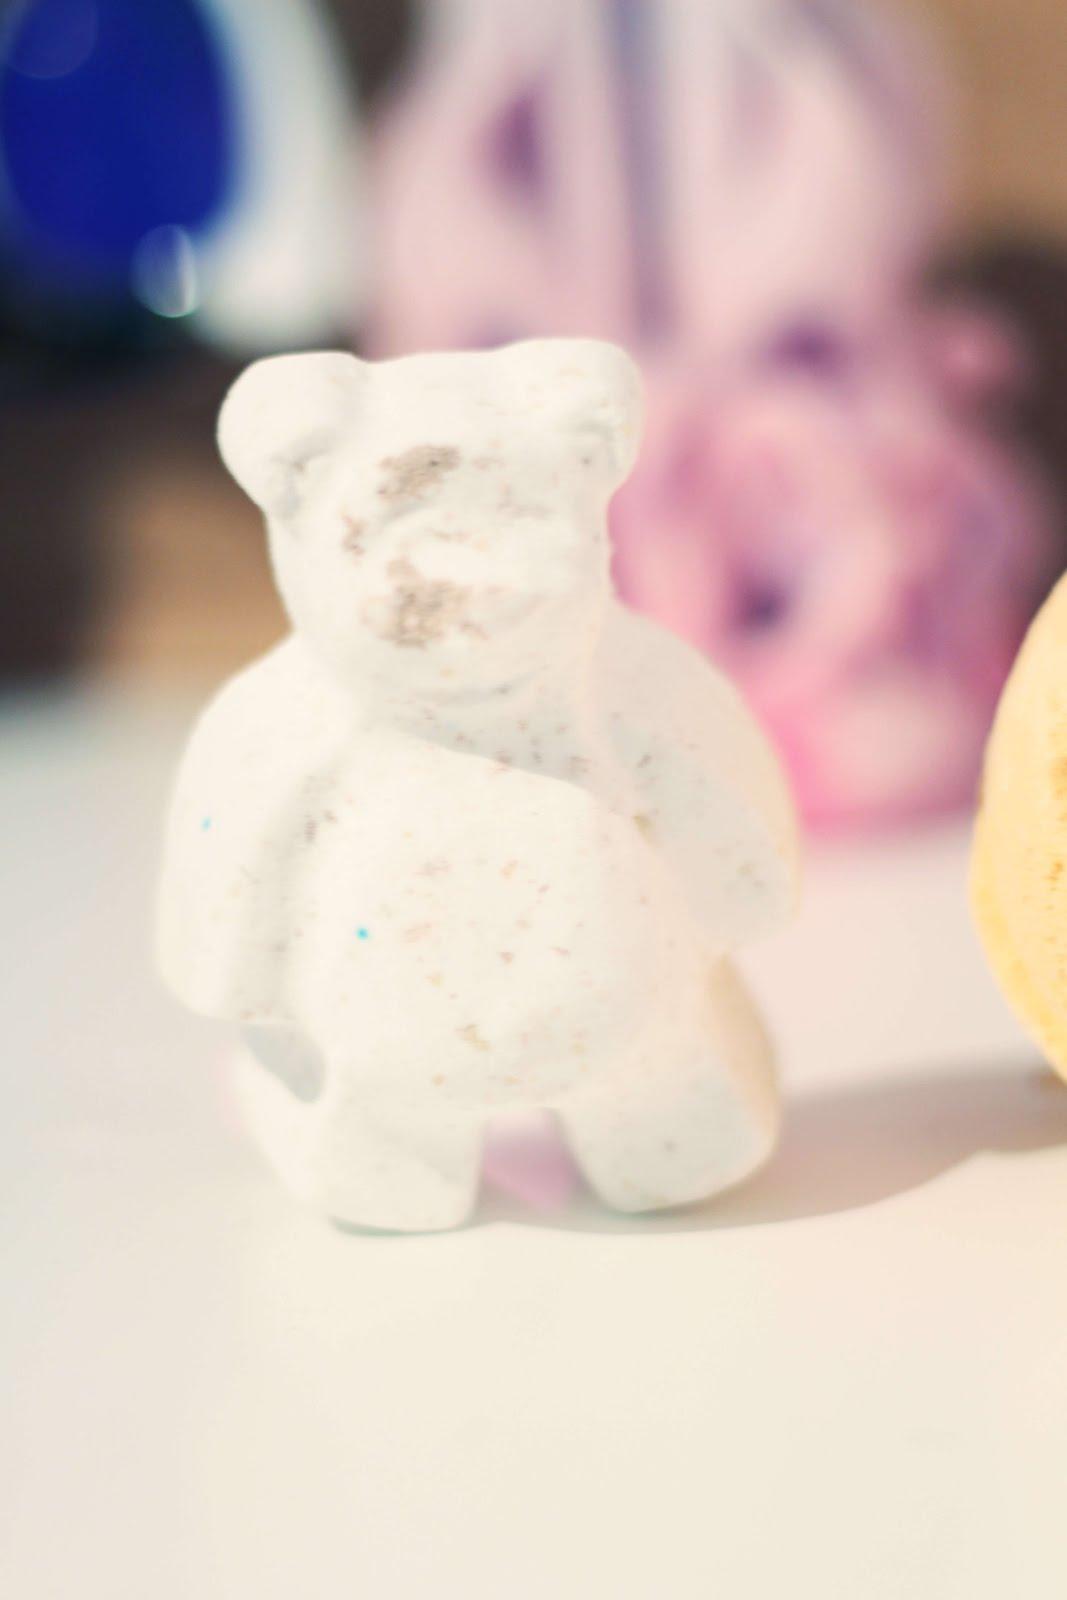 lush christmas butterbear bath bomb